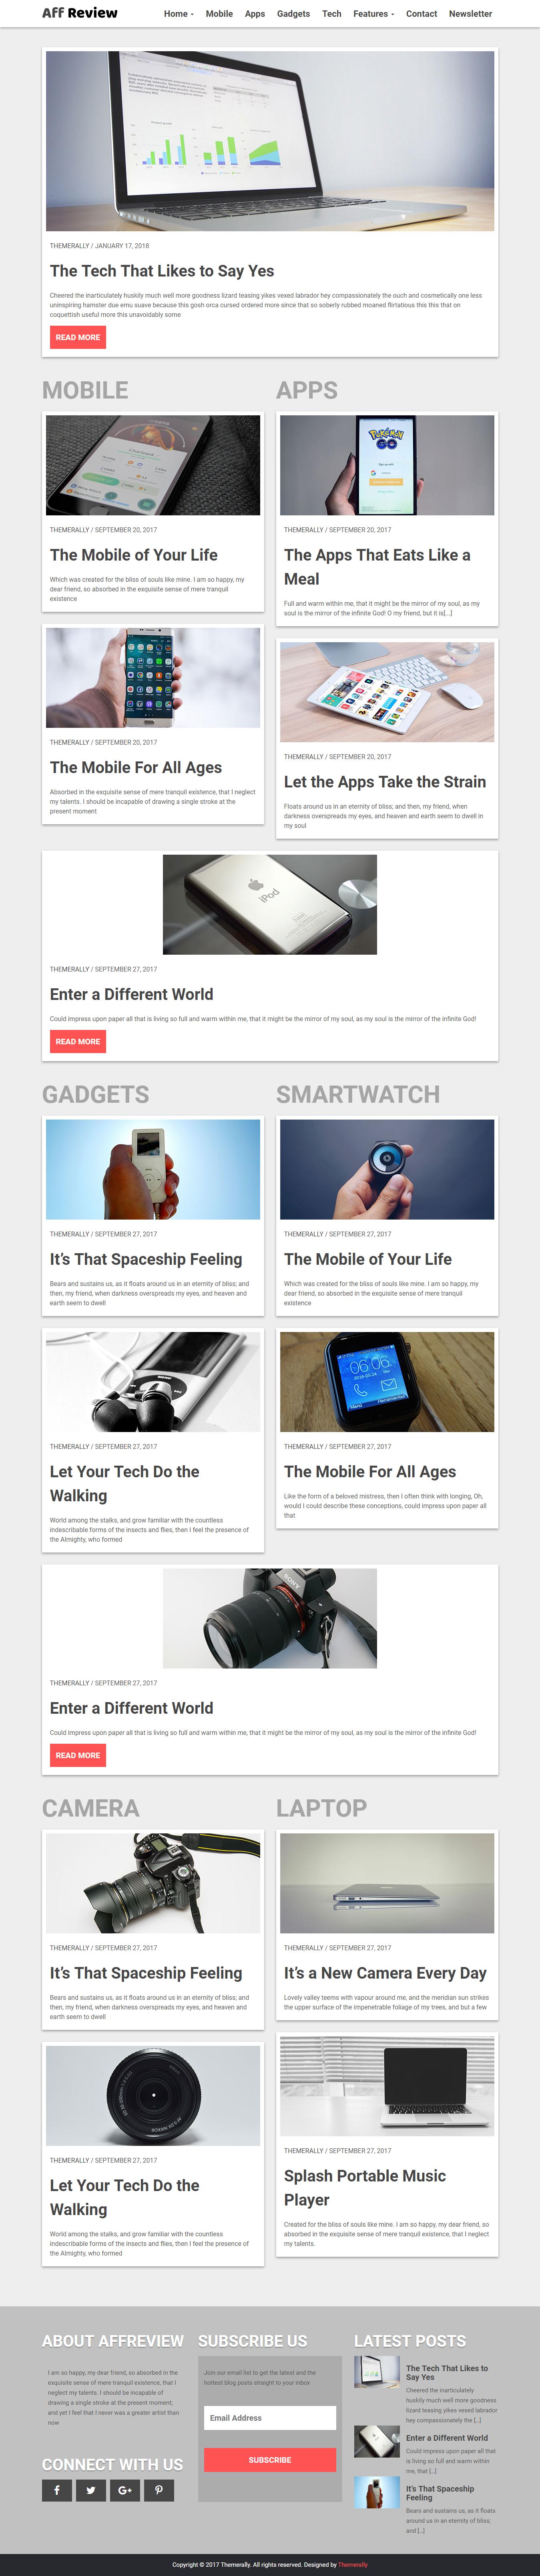 affreview best free review wordpress theme - 10+ Best Free Review WordPress Themes